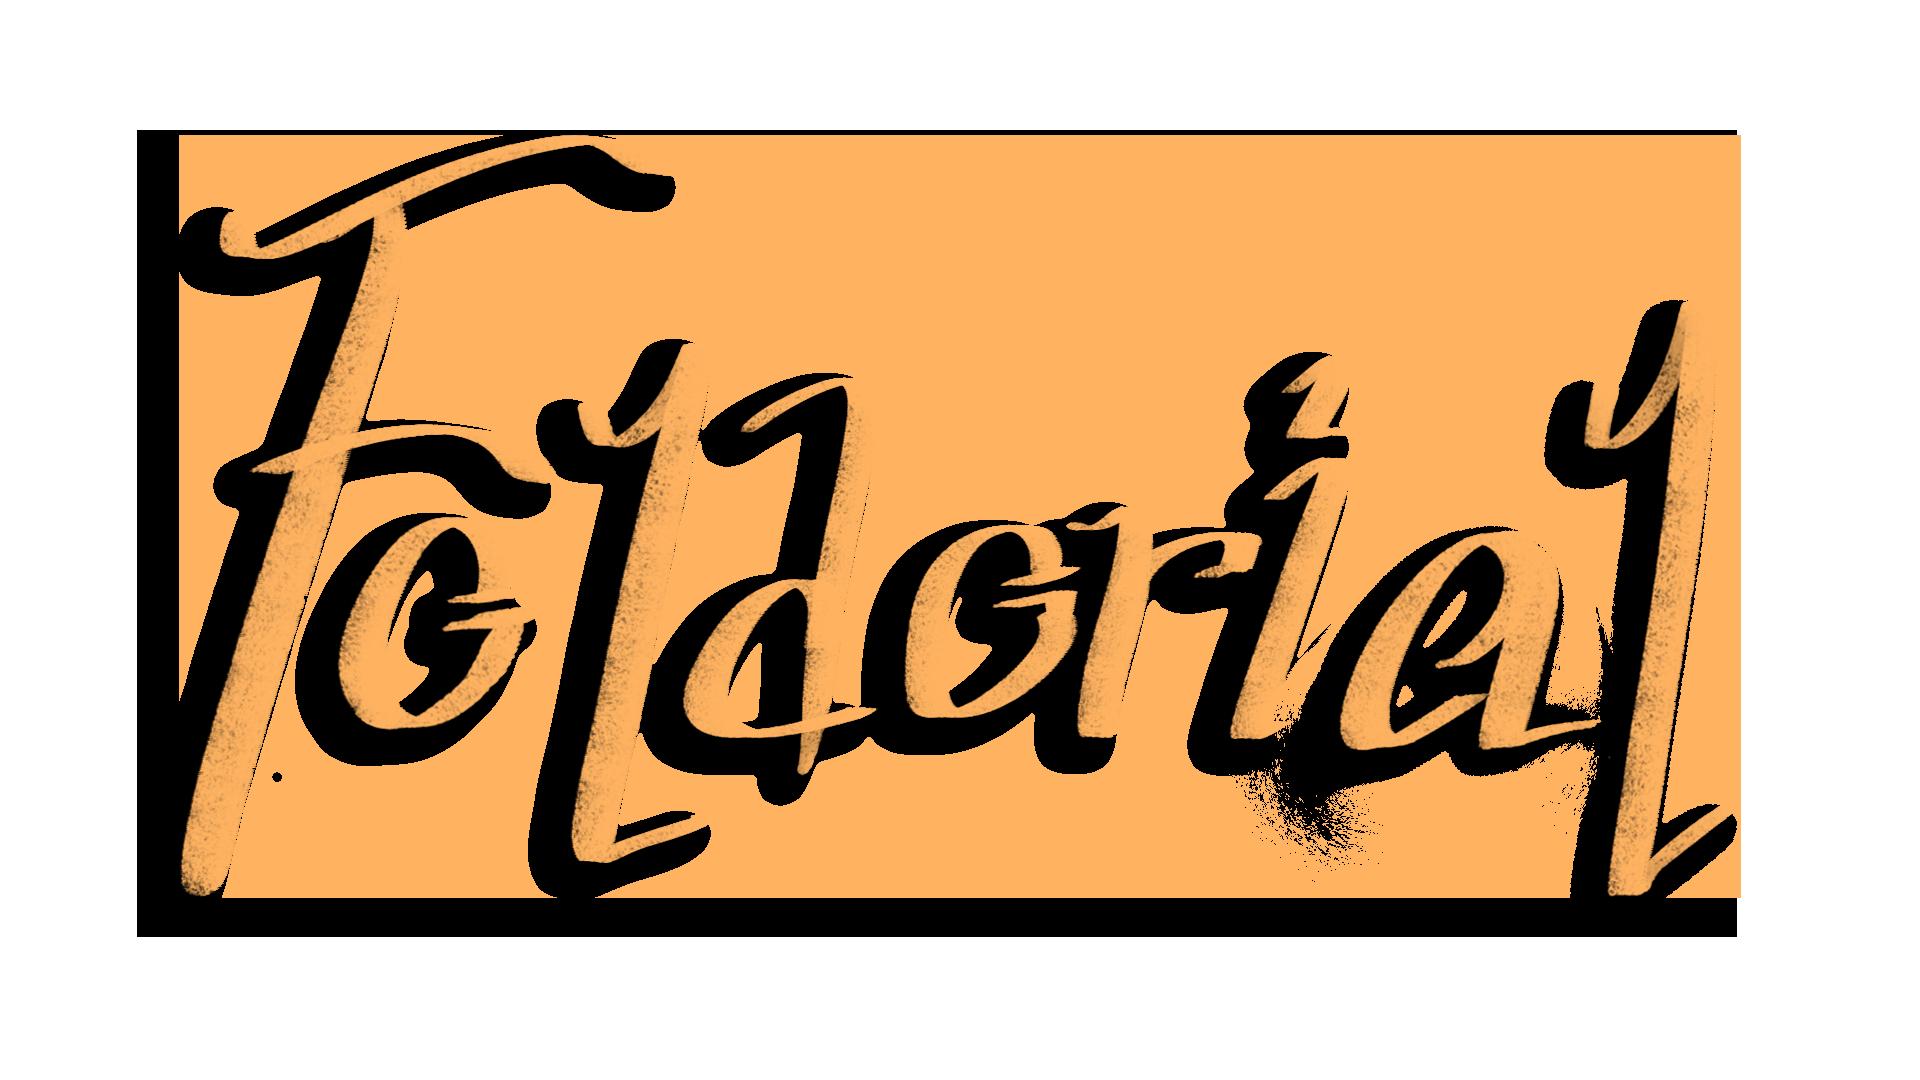 Foldorial